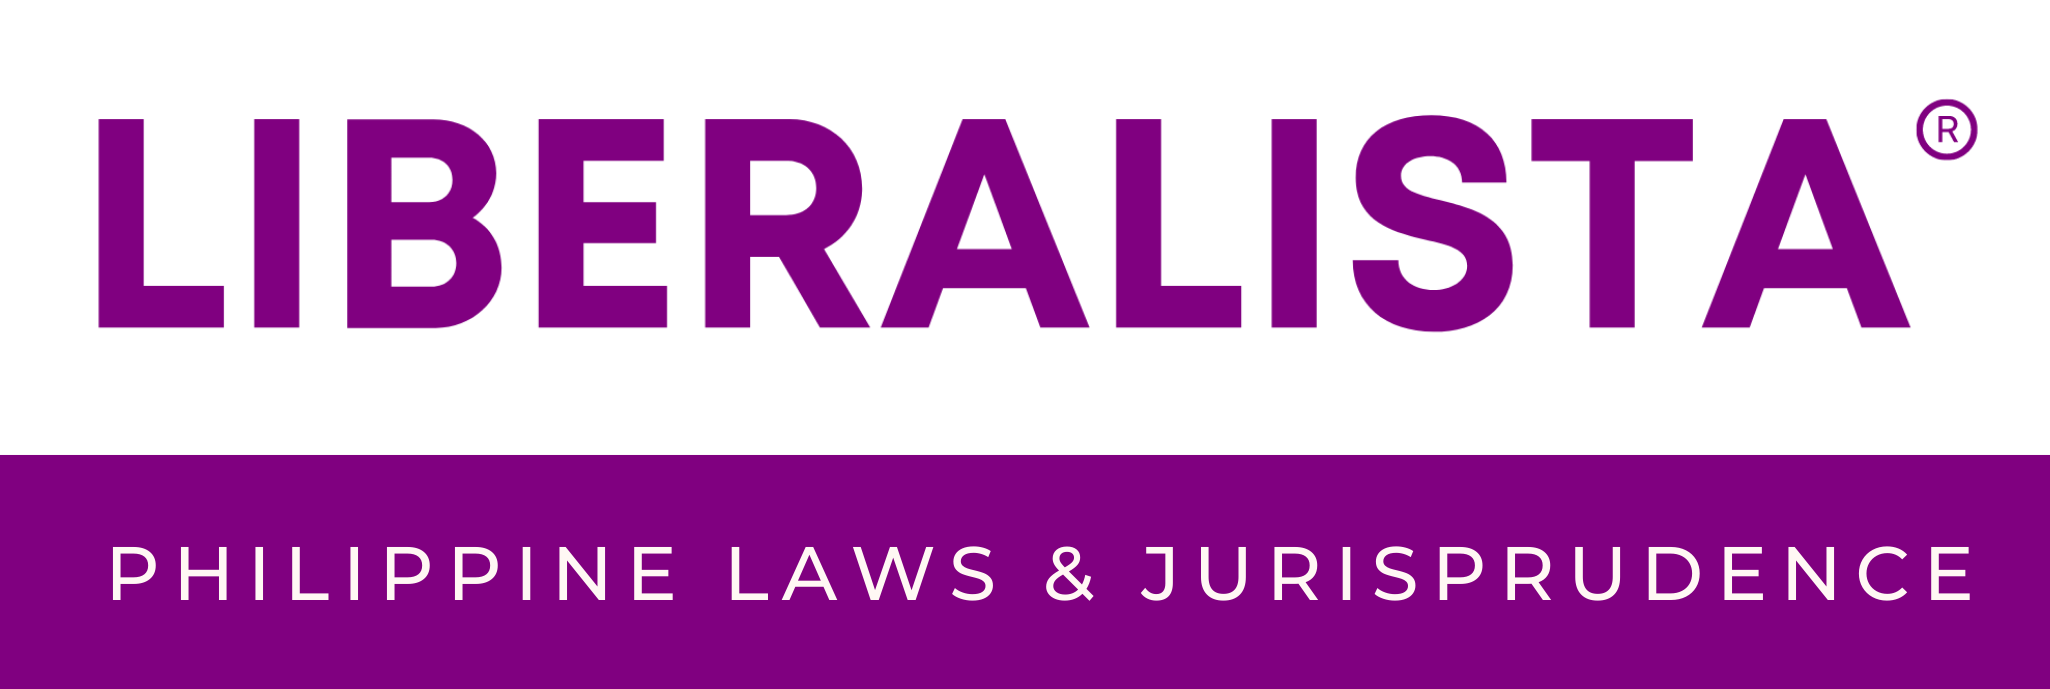 LIBERALISTA: Laws and Jurisprudence.